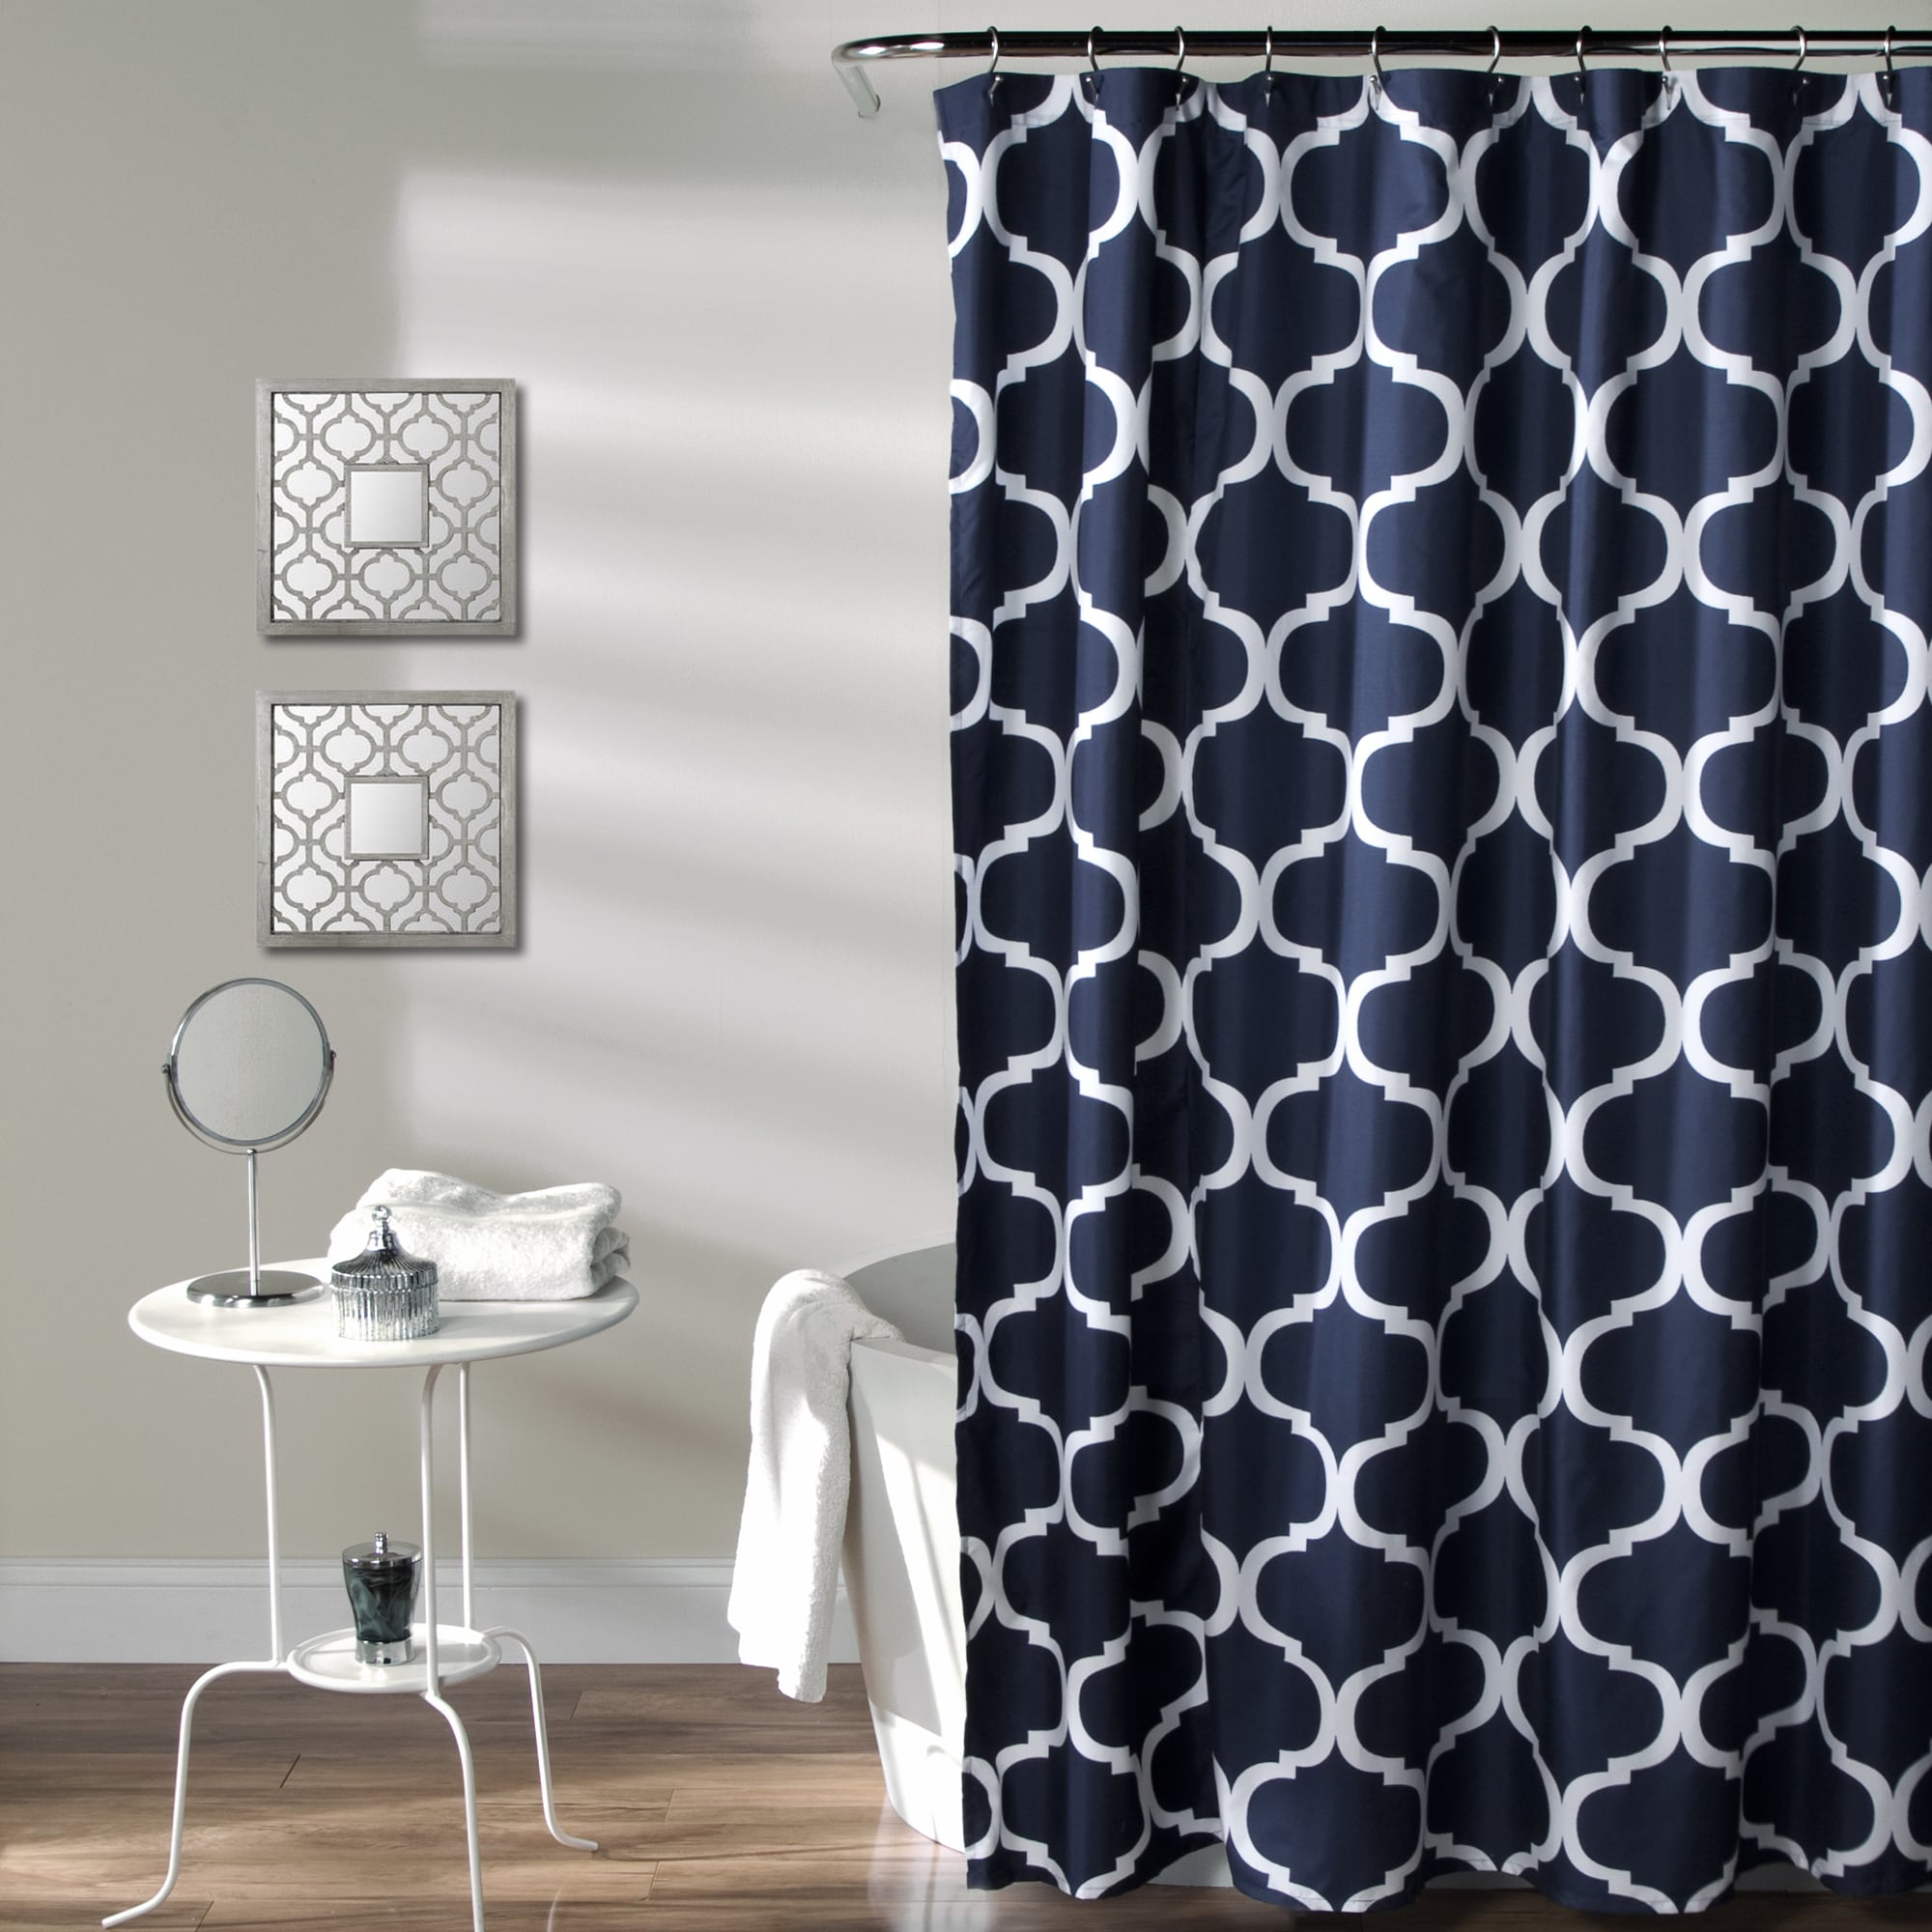 Gracewood Hollow Chidzero Geometric Shower Curtain